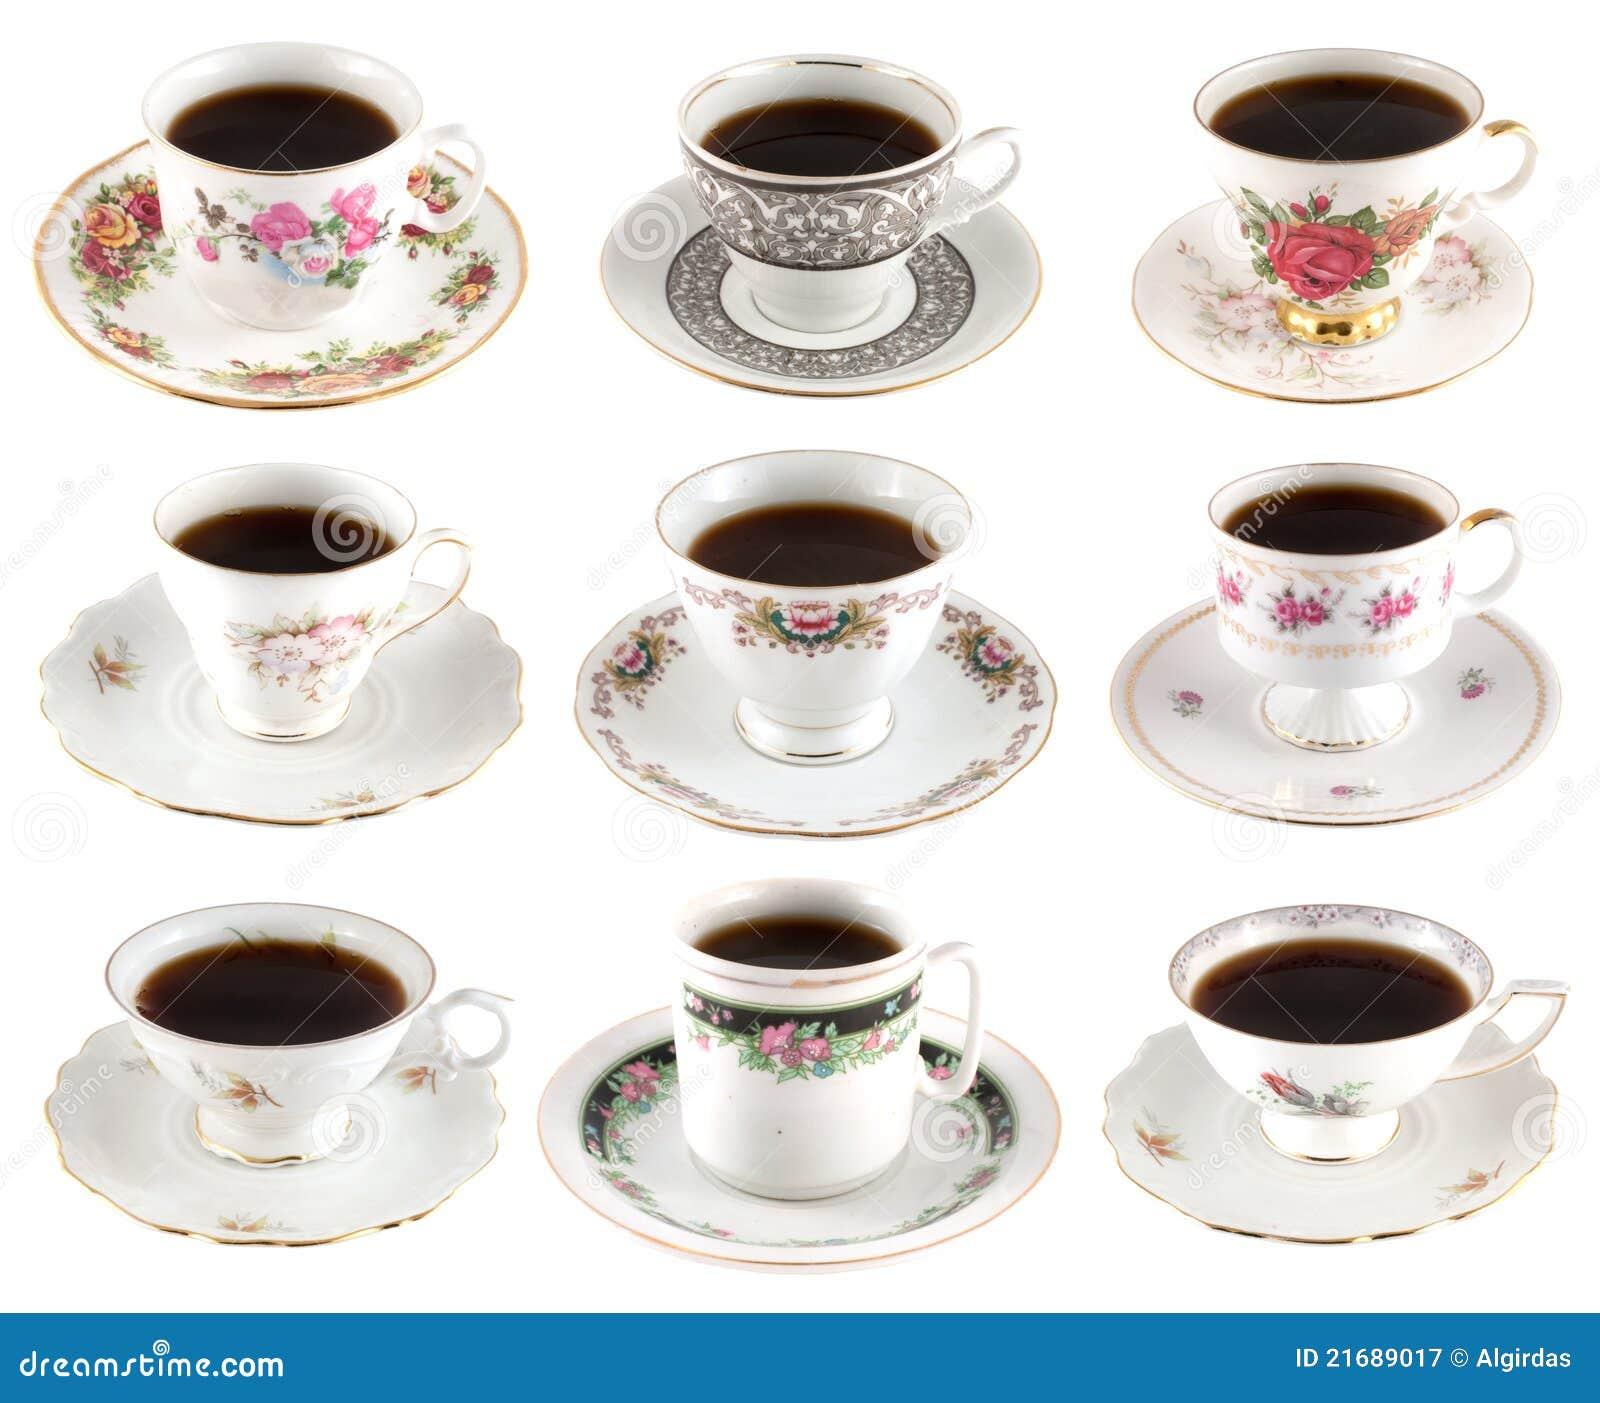 Vintage coffee cups